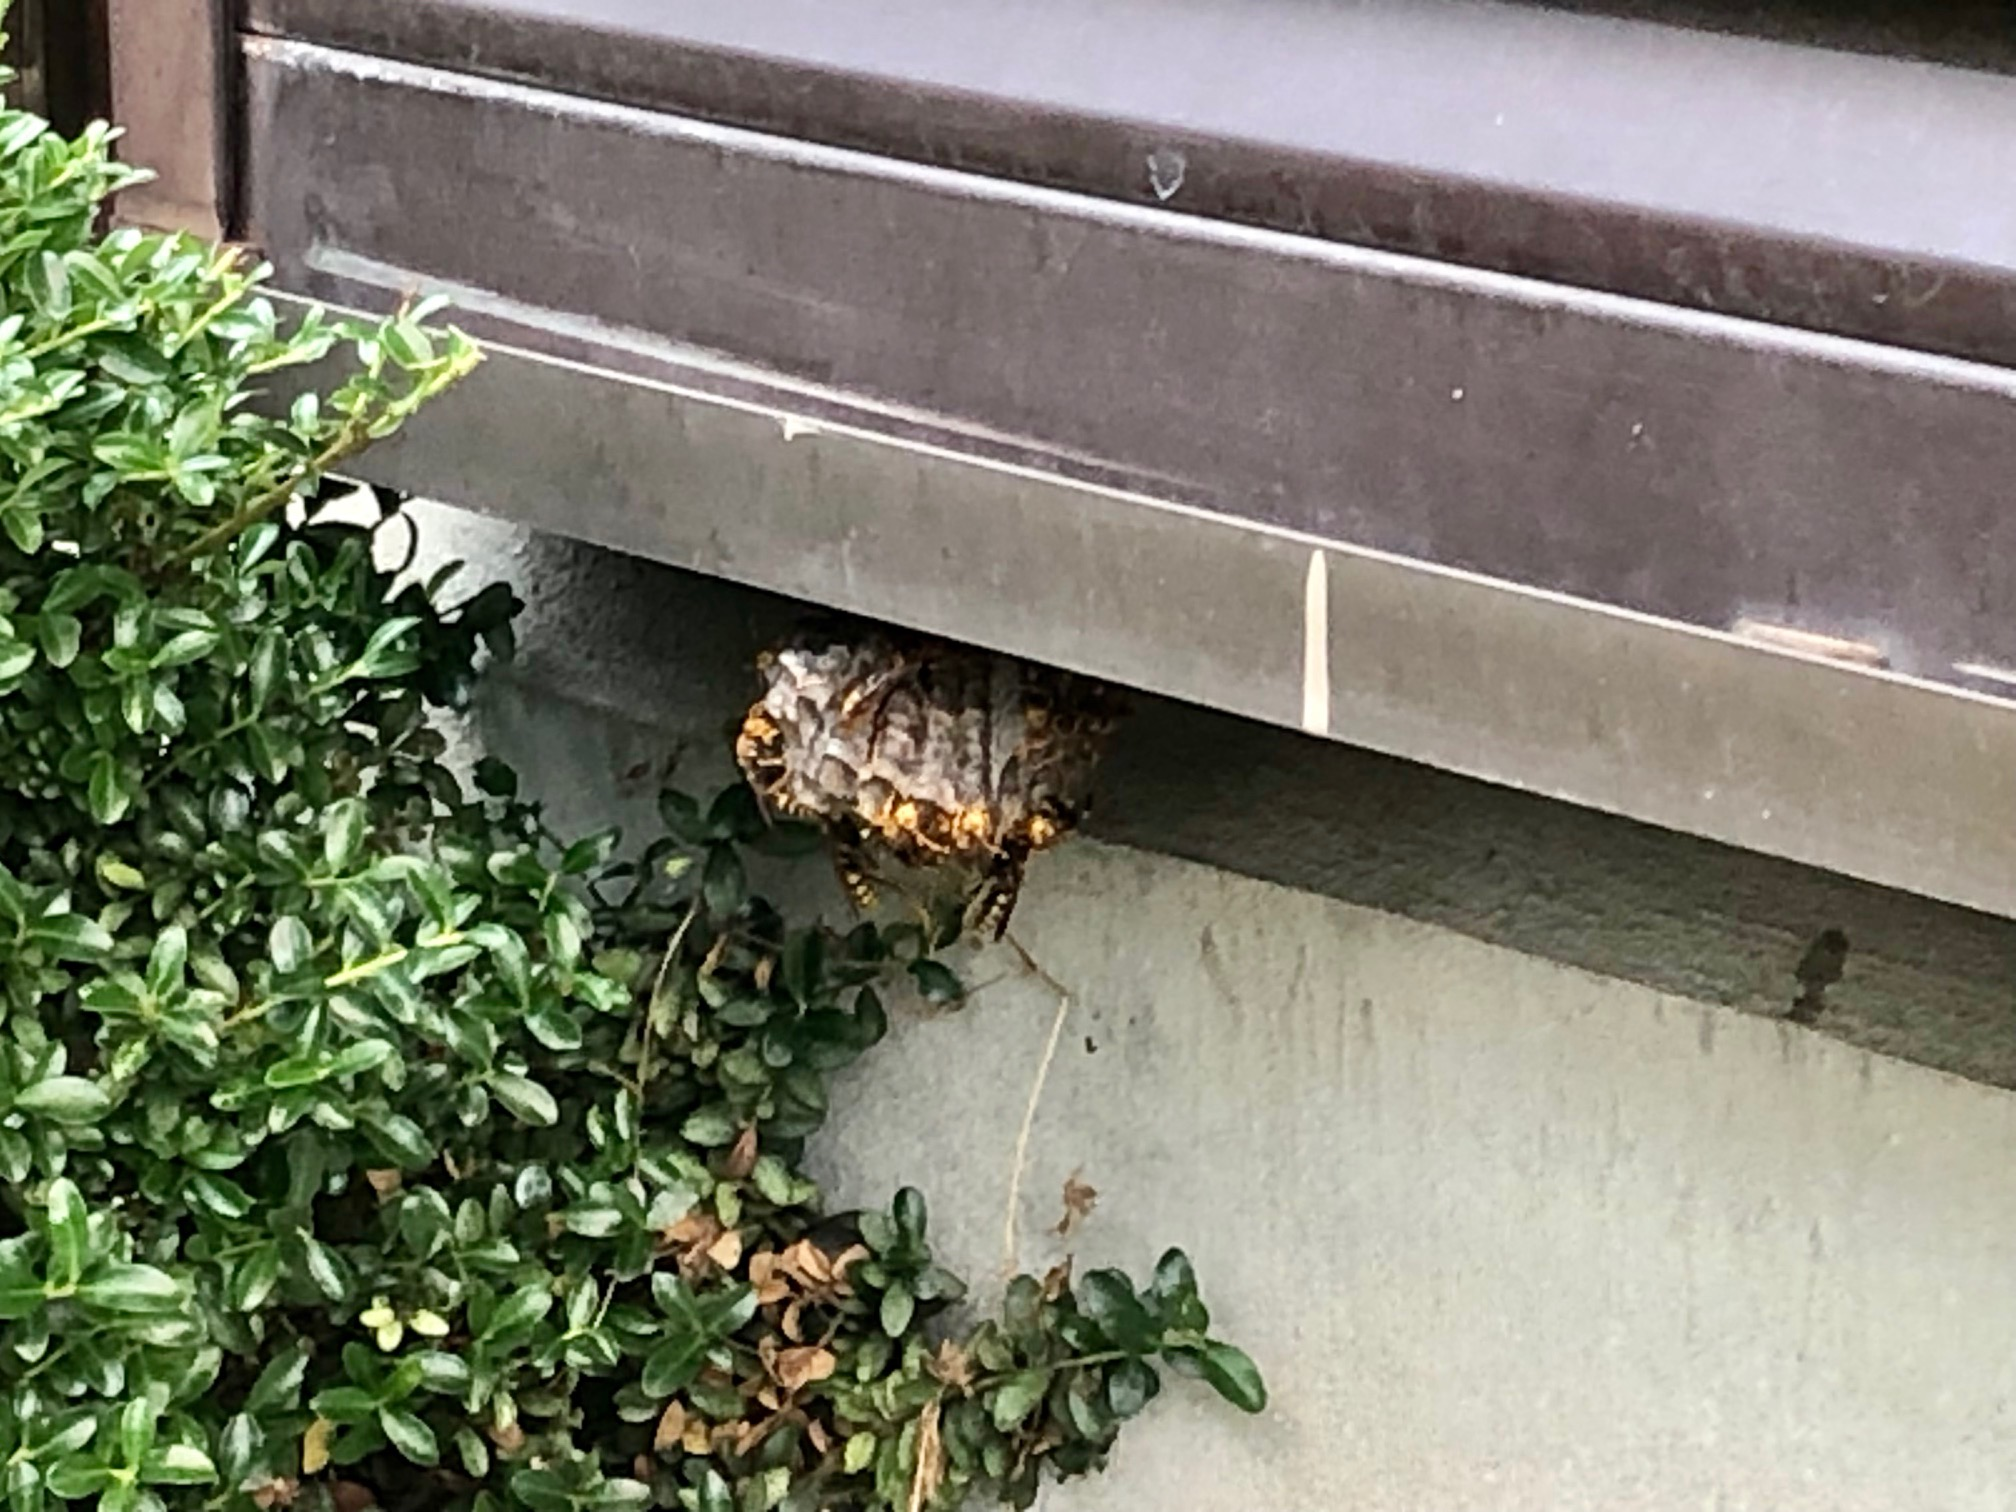 蜂の巣 退治 軒下 梅雨